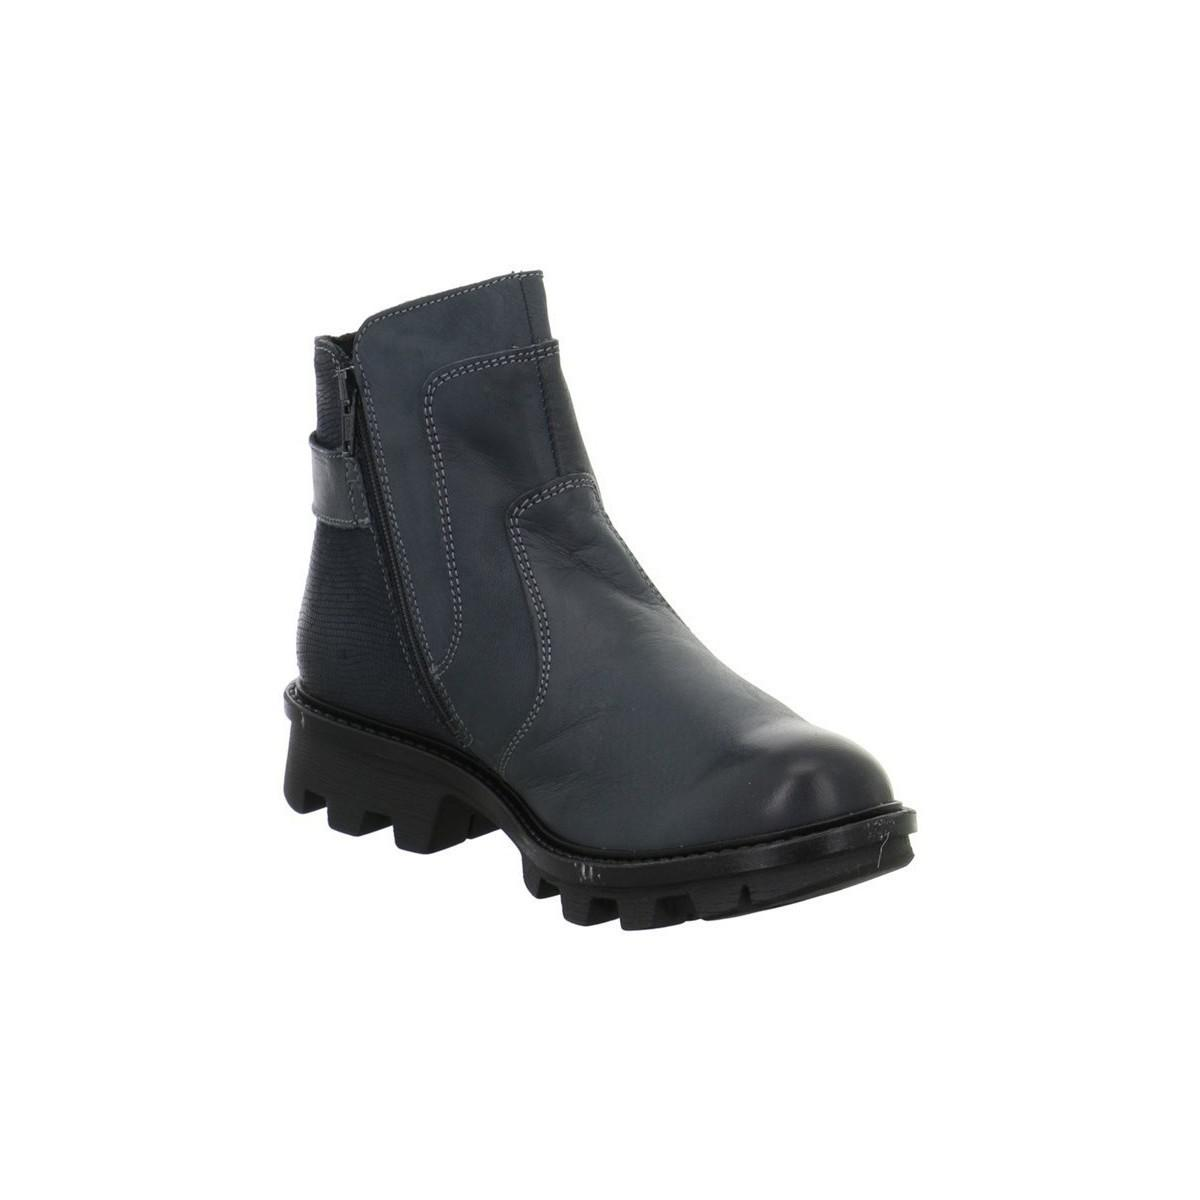 Josef Seibel Marylin 05 Women's Low Ankle Boots In Blue